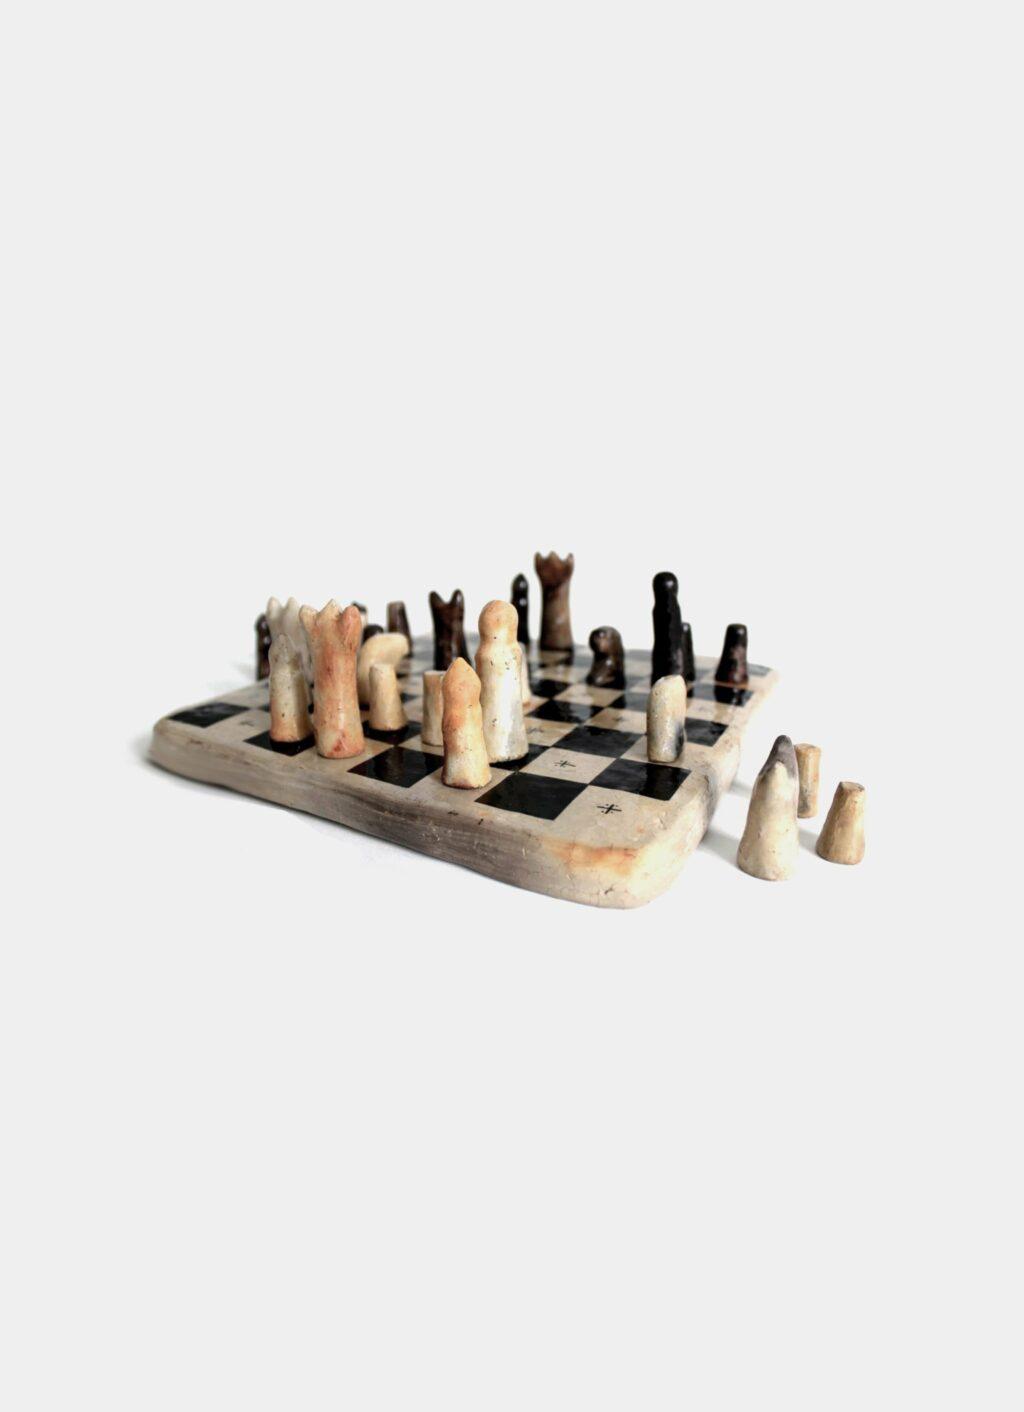 Flayou - Chich-Bich - Chess black